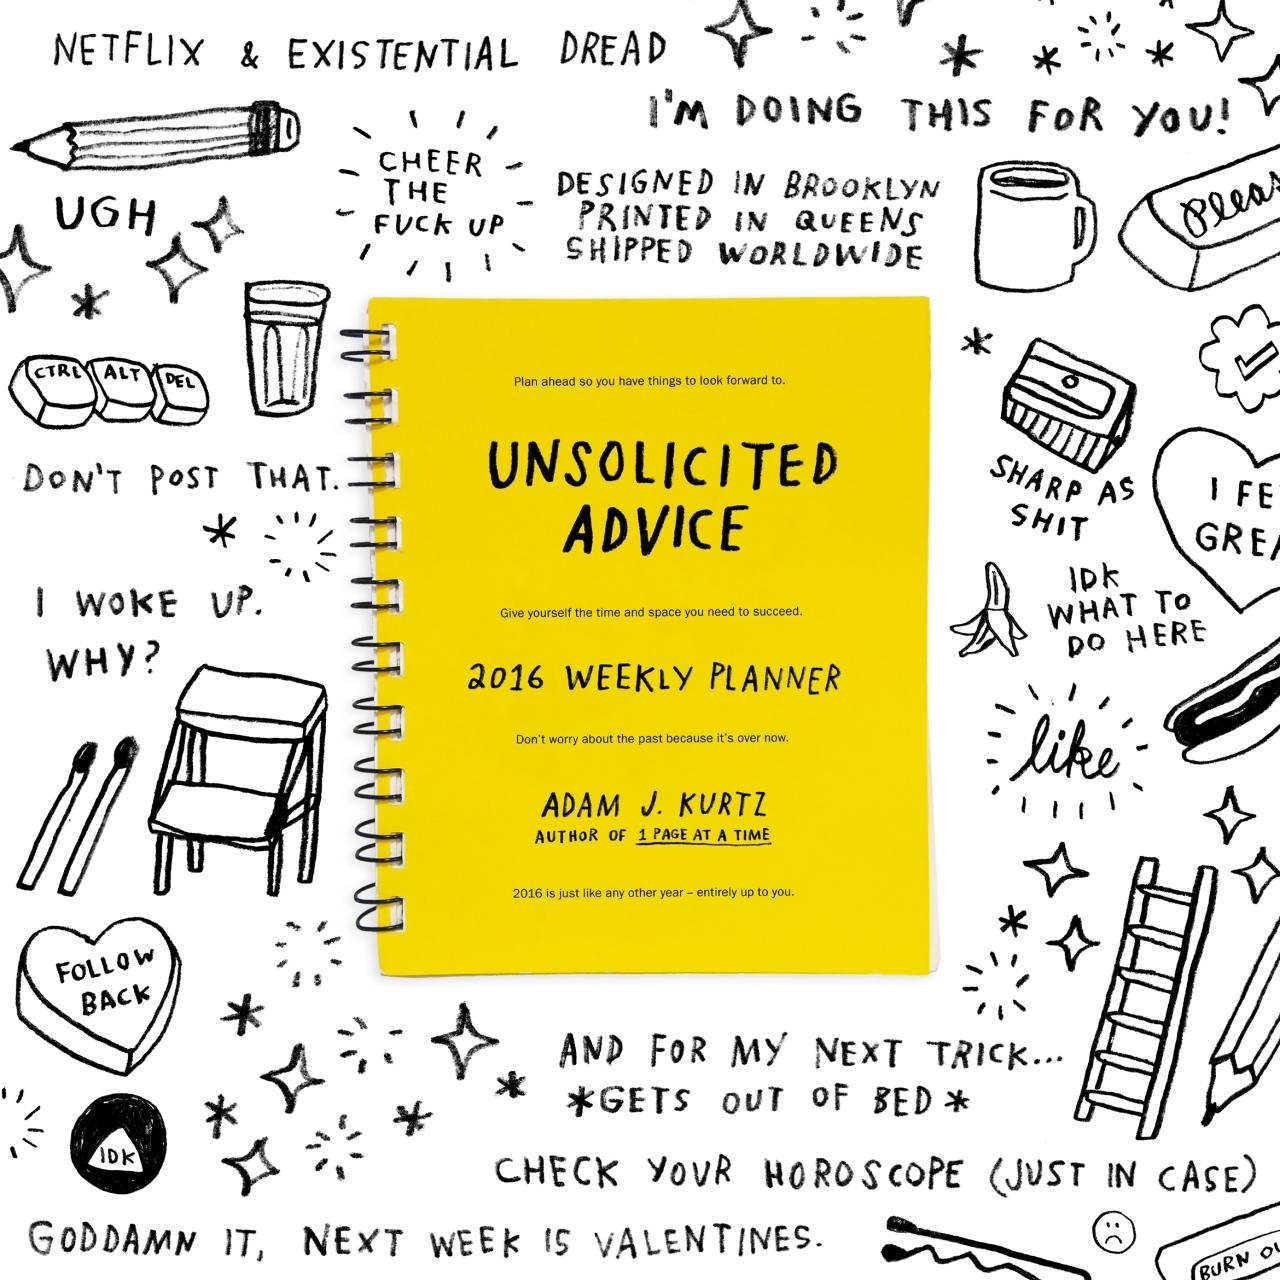 Unsolicited Advice 2016 (via Adam J. Kurtz)